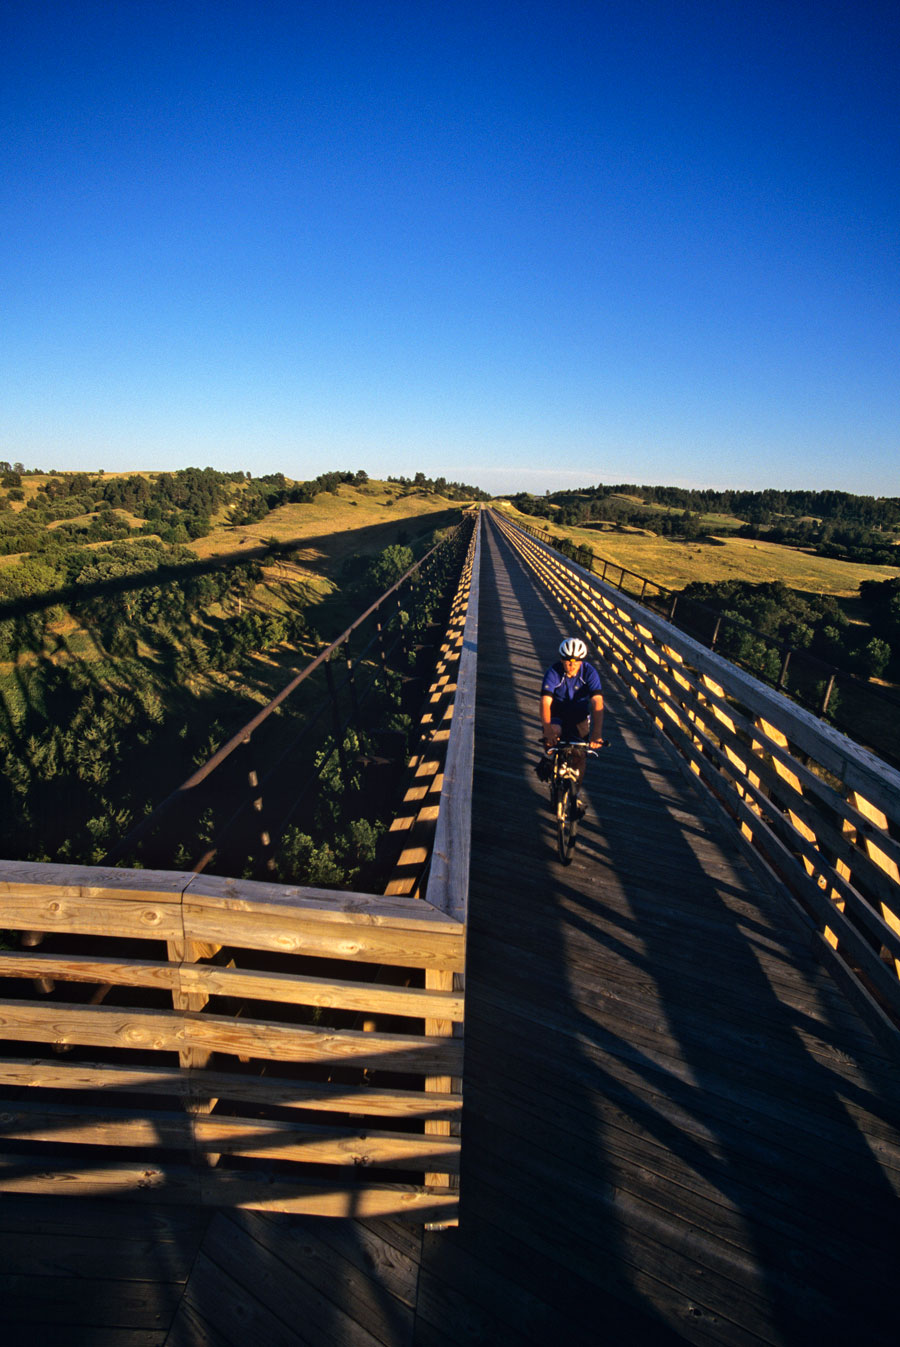 Nebraska: The Cowboy Trail